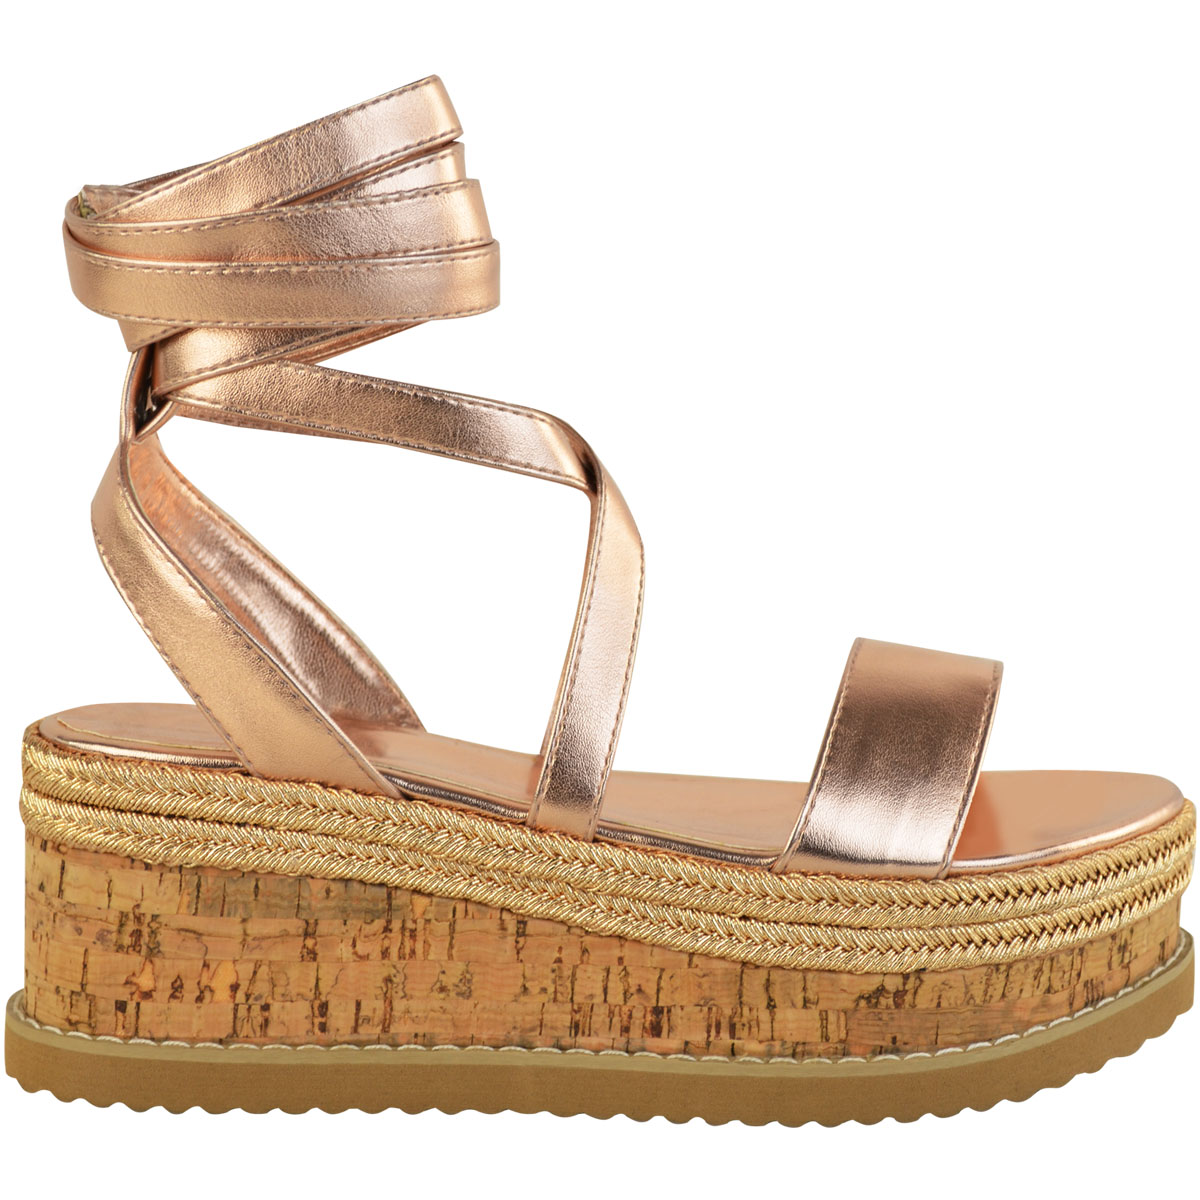 Womens-Ladies-Flat-Wedge-Espadrille-Lace-Tie-up-Sandals-Platform-Summer-Shoes